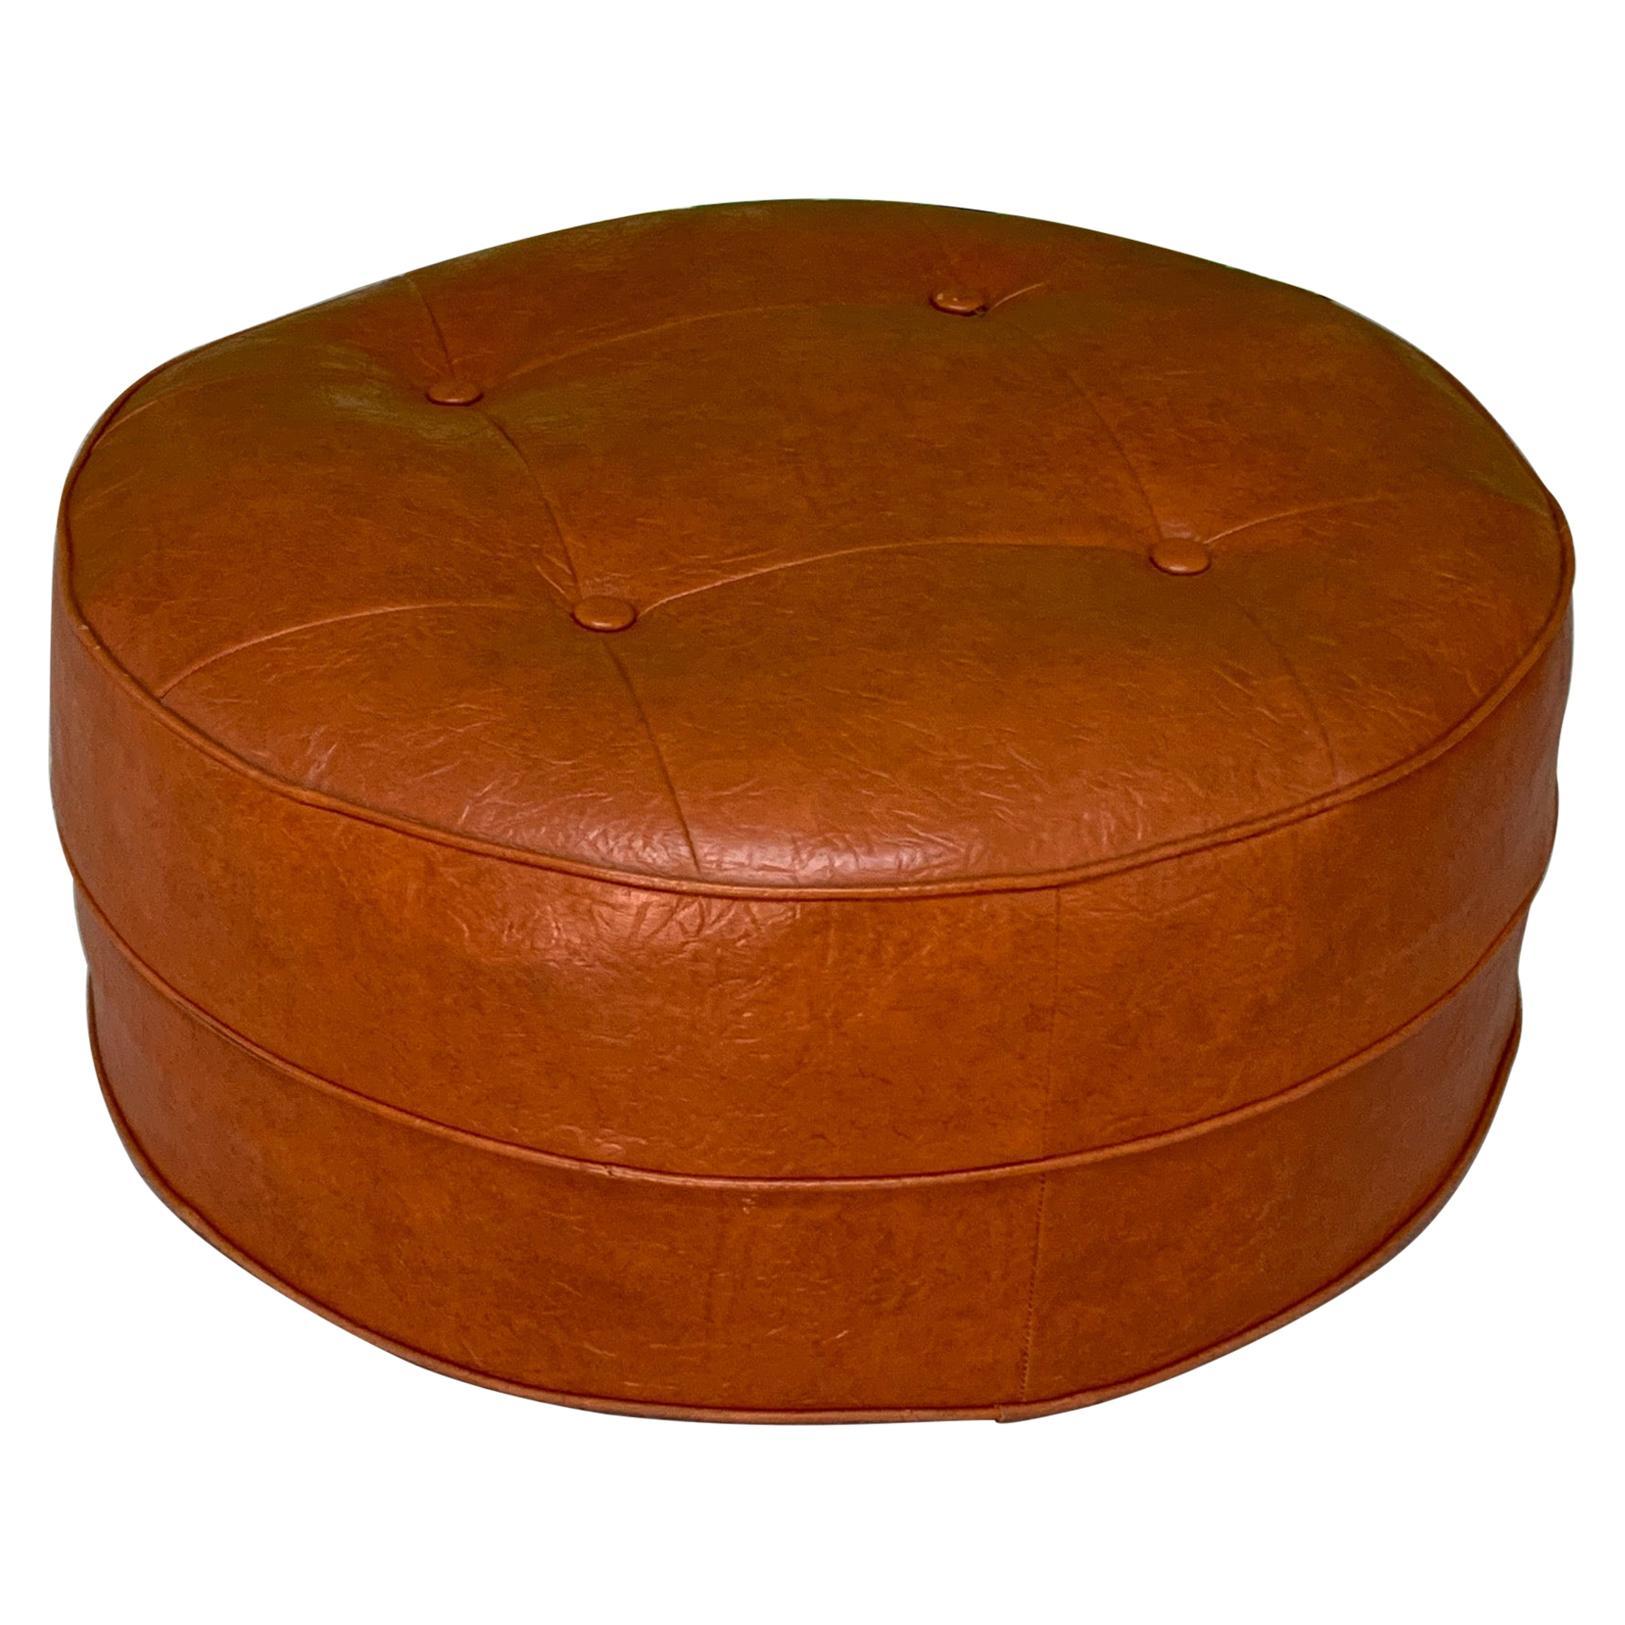 midcentury round hassock or footstool